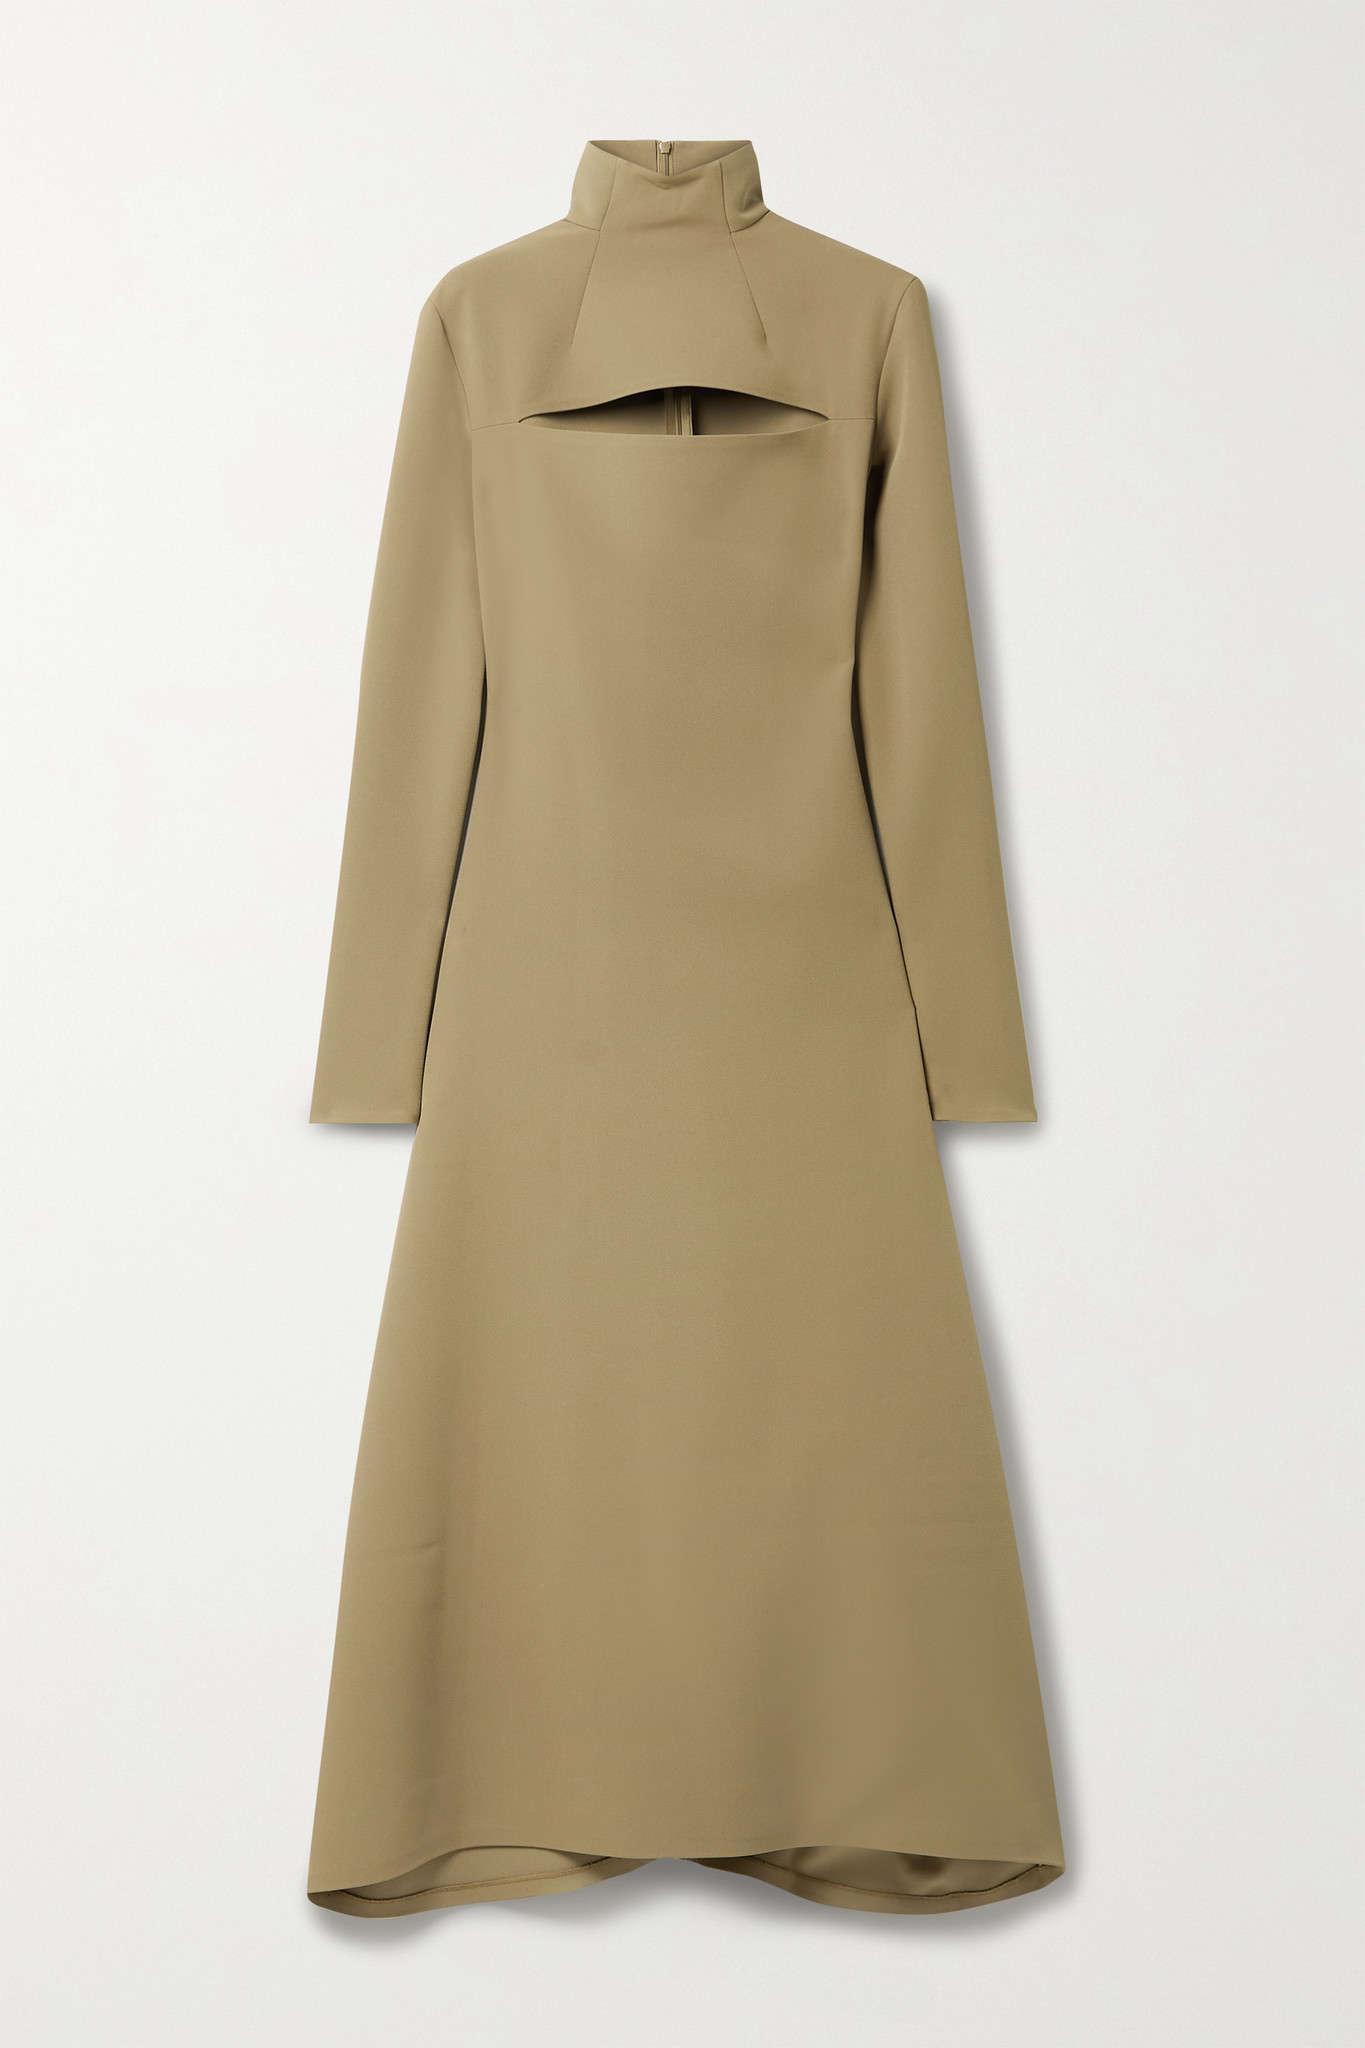 A.W.A.K.E. MODE - 不对称挖剪卡迪面料高领连衣裙 - 棕色 - FR36